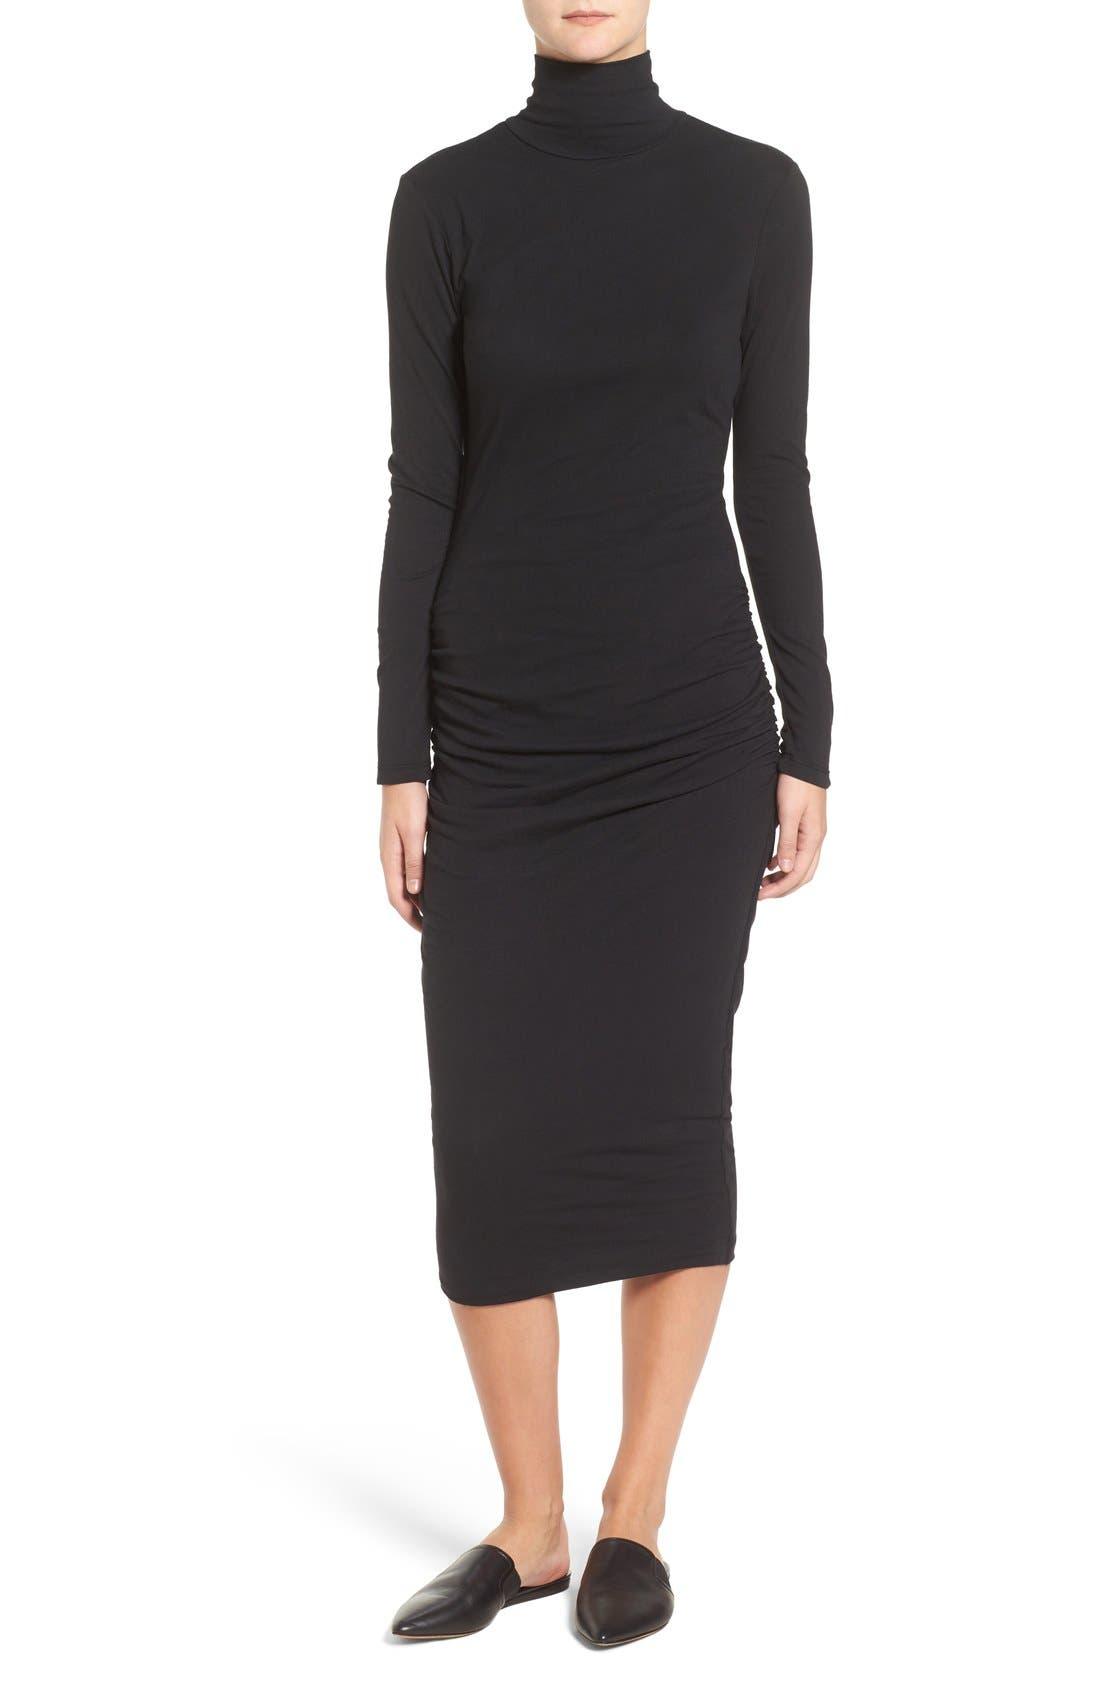 Alternate Image 1 Selected - James Perse Turtleneck Midi Dress